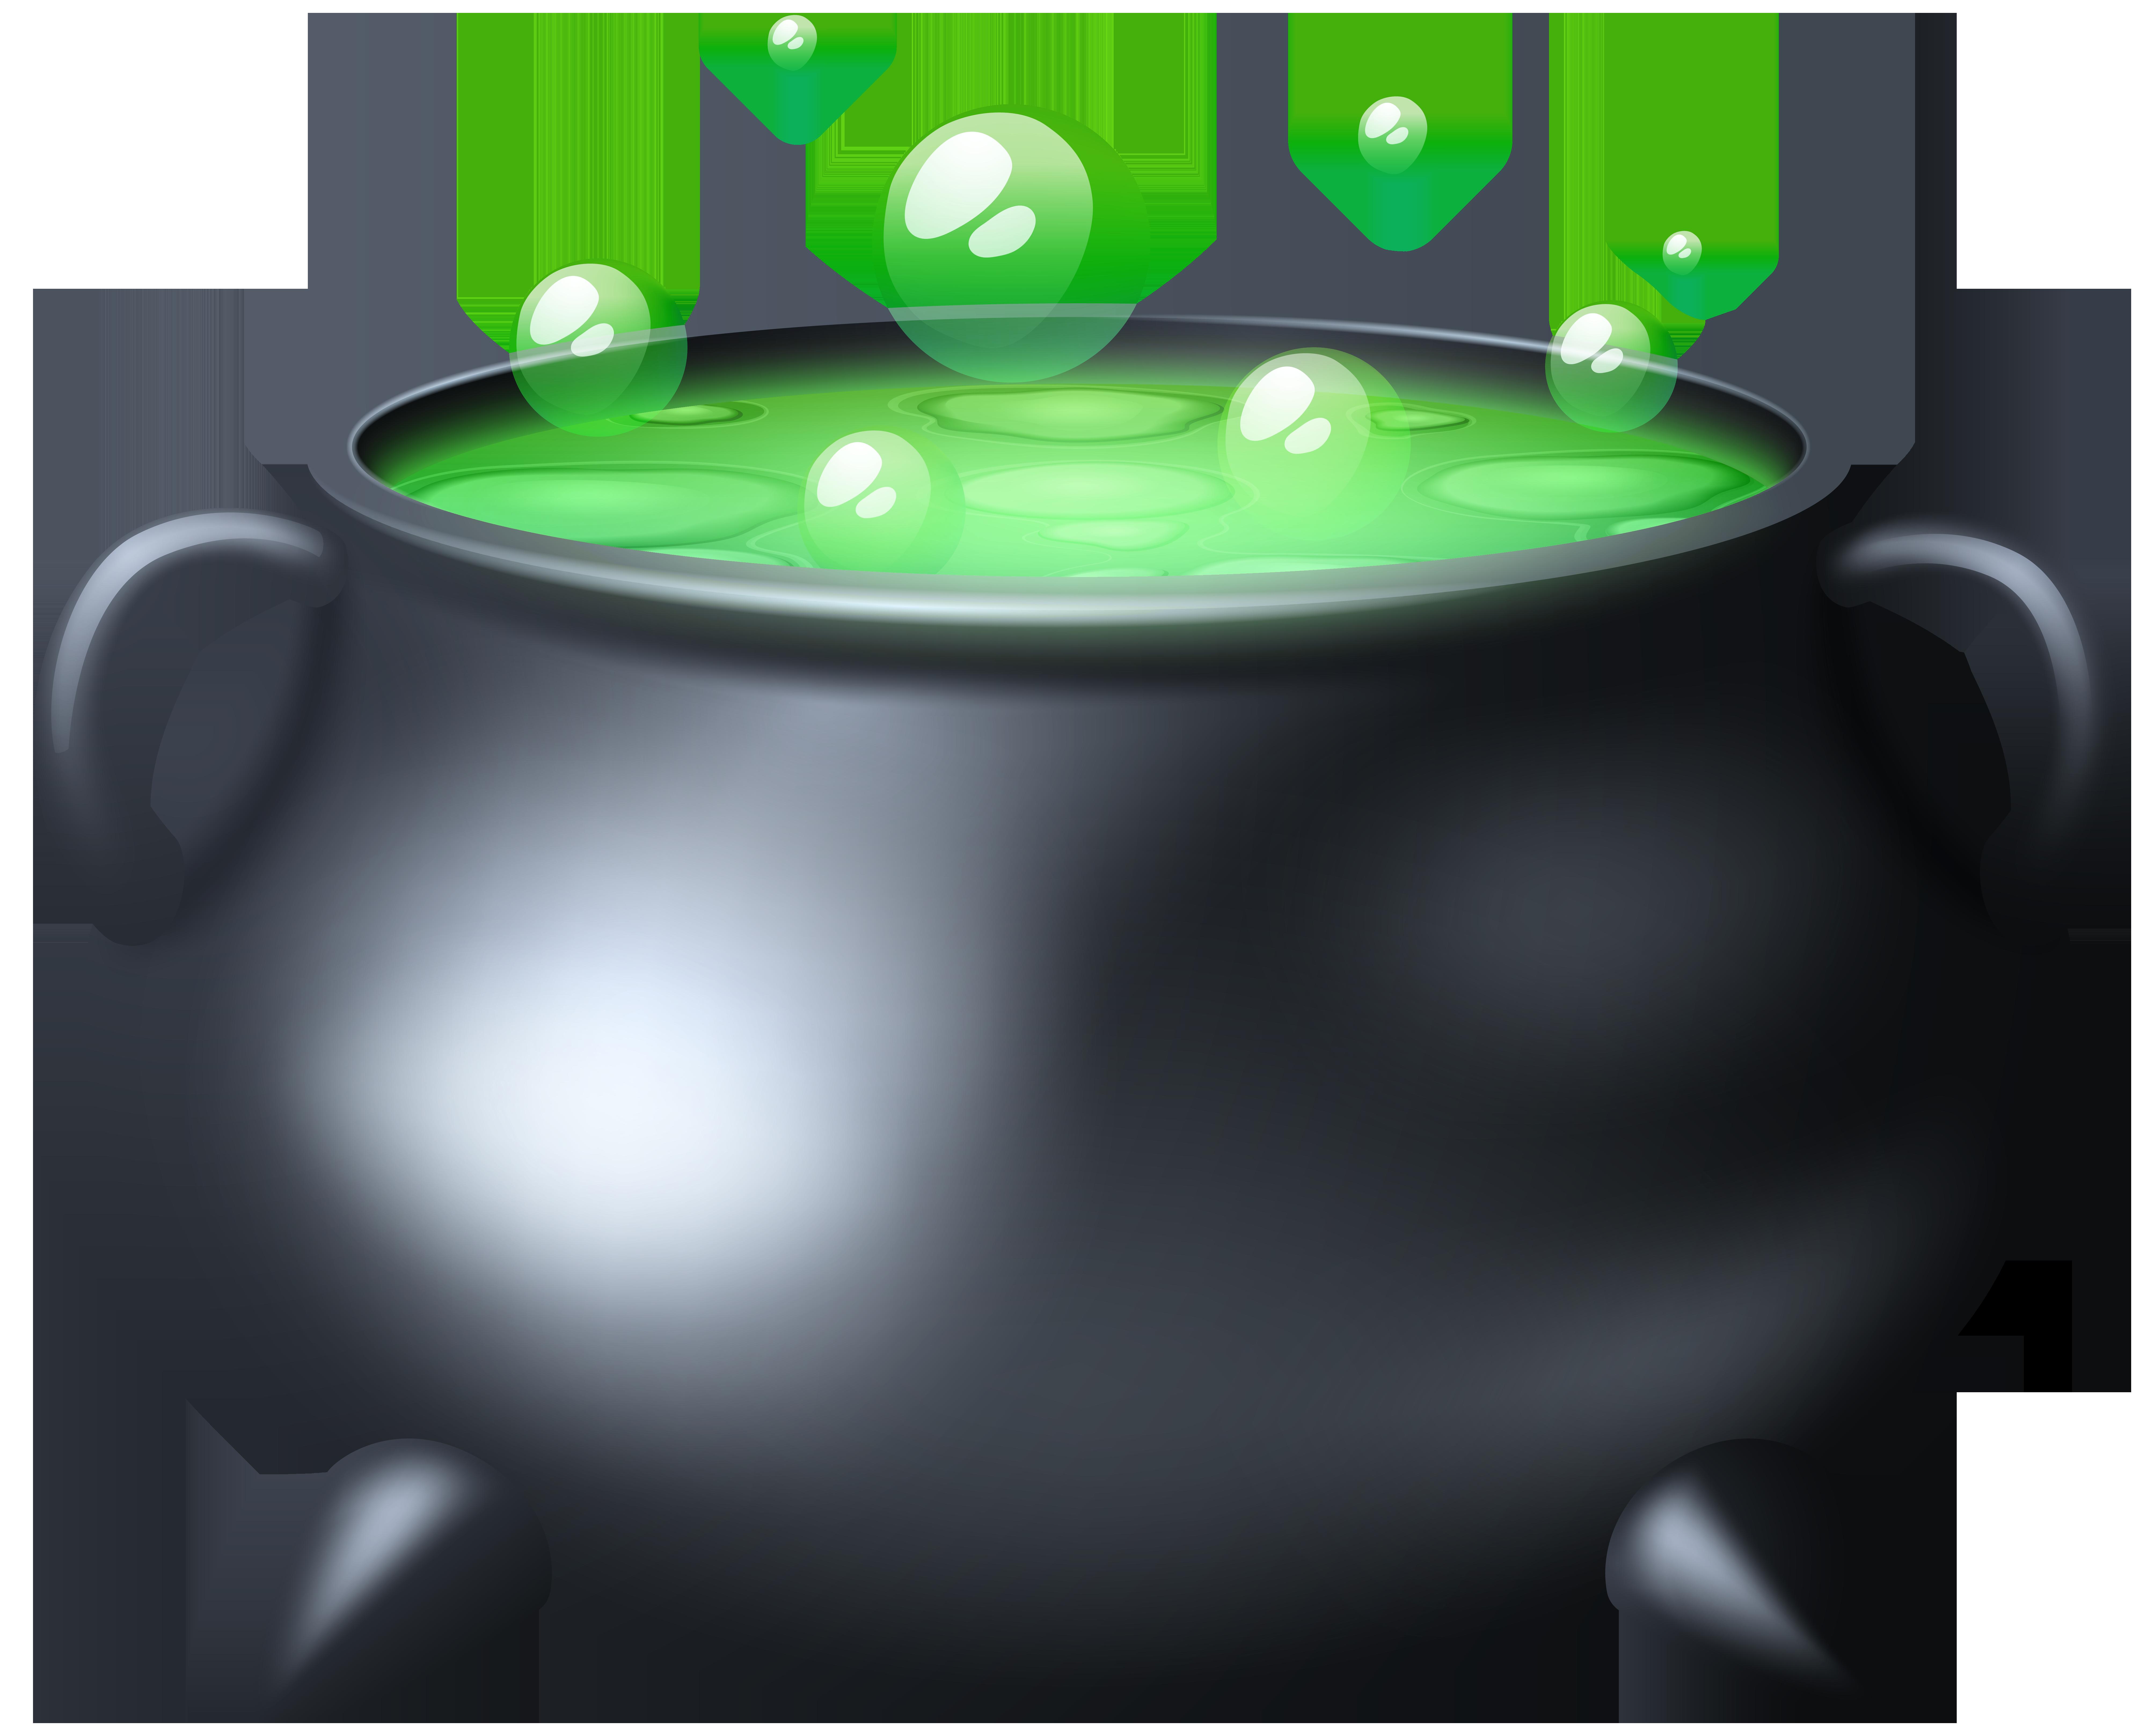 Halloween cauldron clipart jpg freeuse download Black Cauldron PNG Clipart Image   Gallery Yopriceville - High ... jpg freeuse download